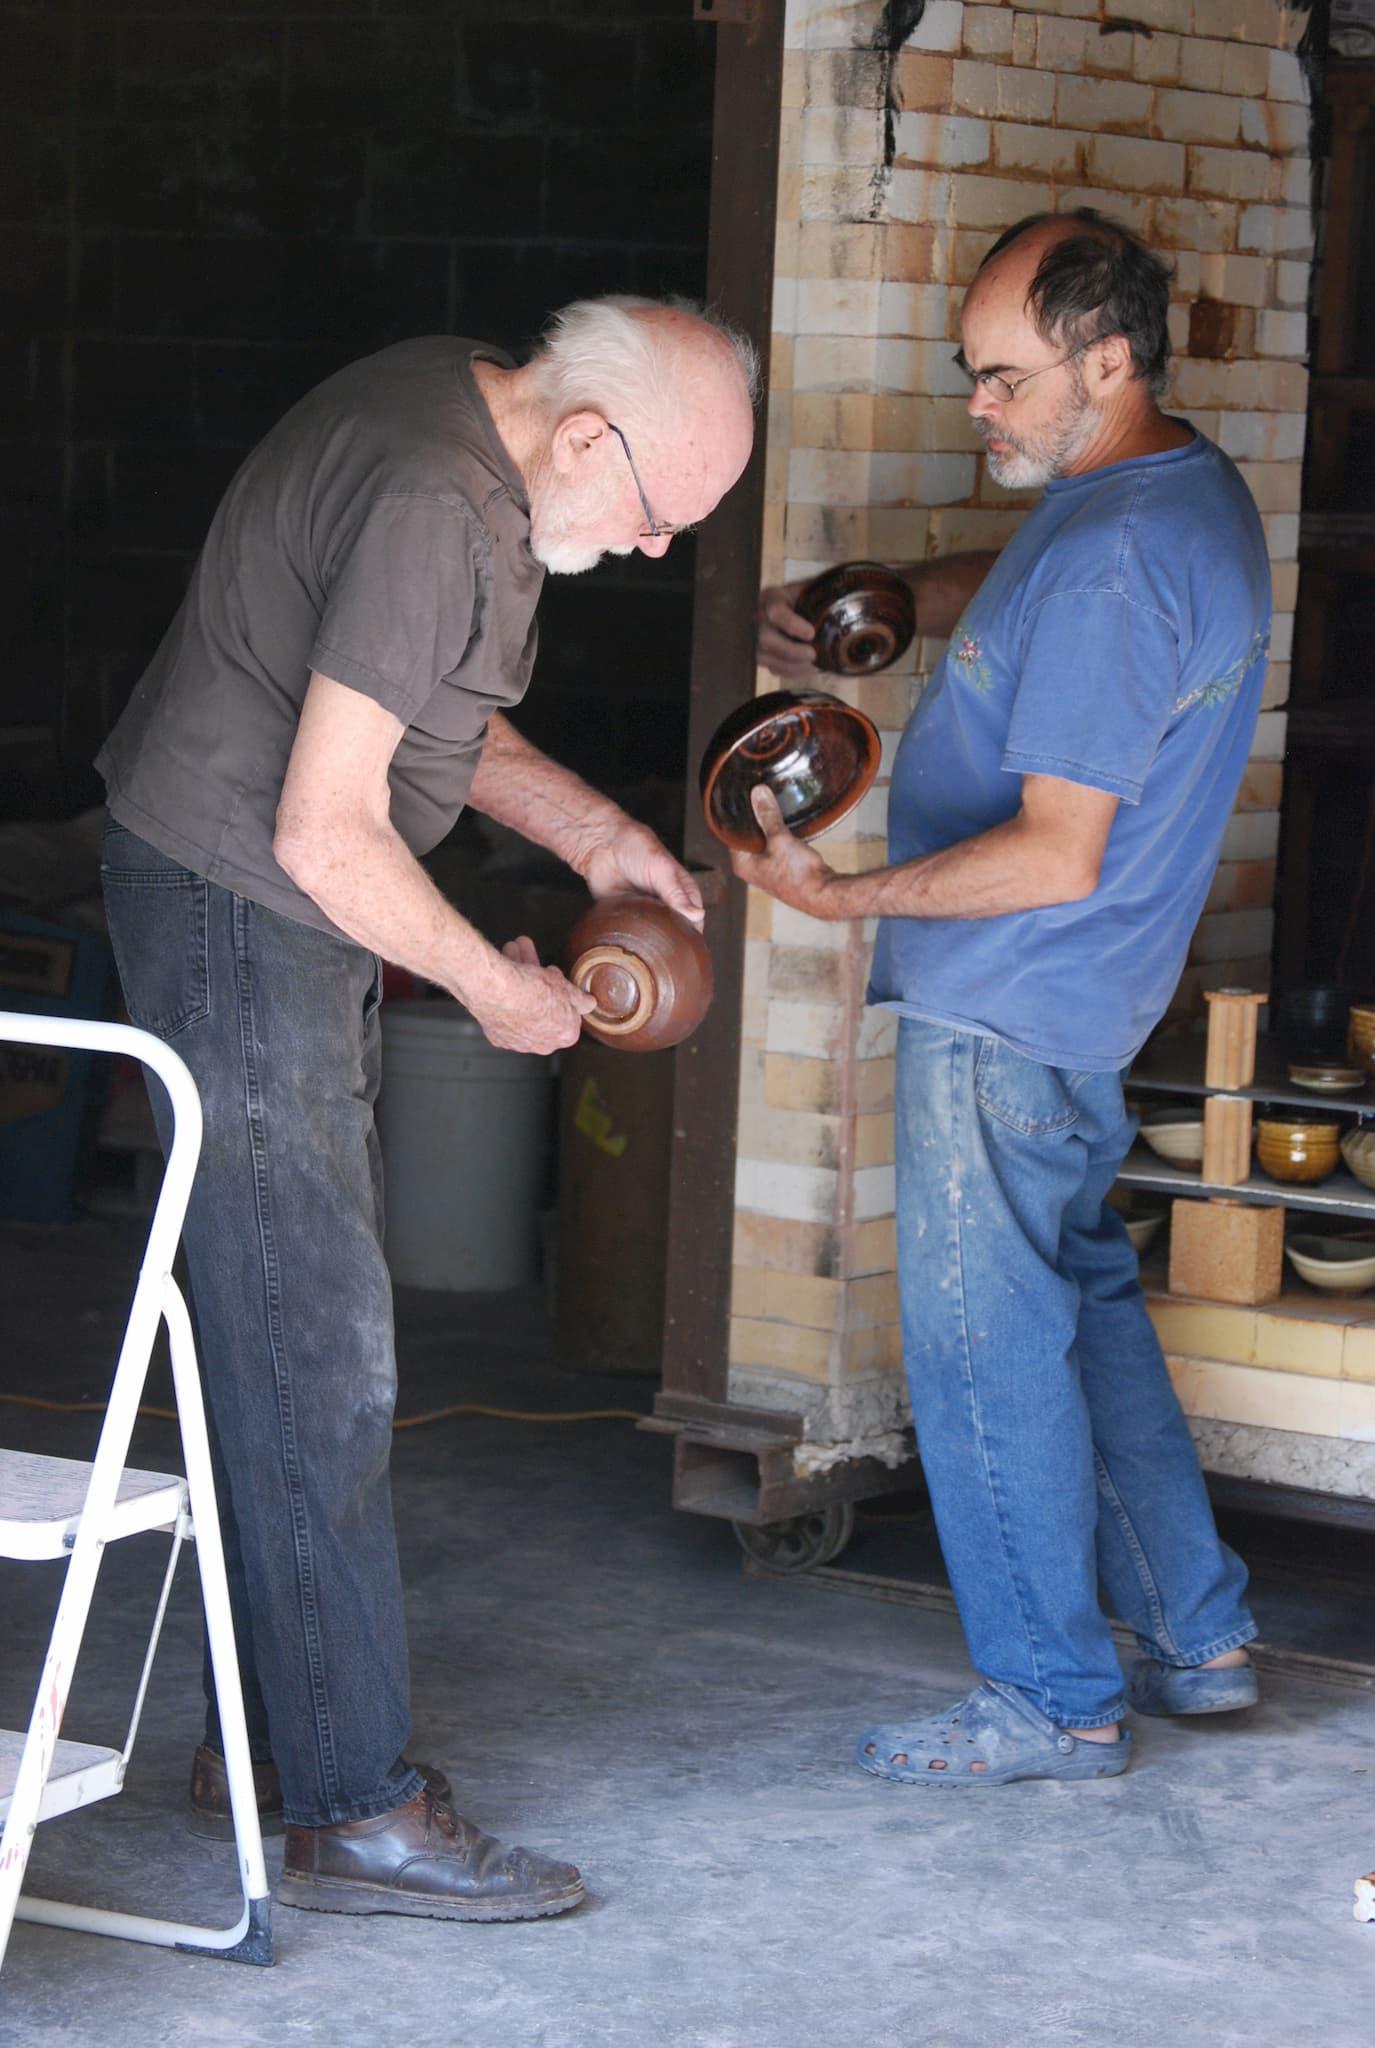 Warren MacKenzie & Guillermo Cuellar inspect the results of a firing, 2015. Courtesy of Guillermo Cuellar